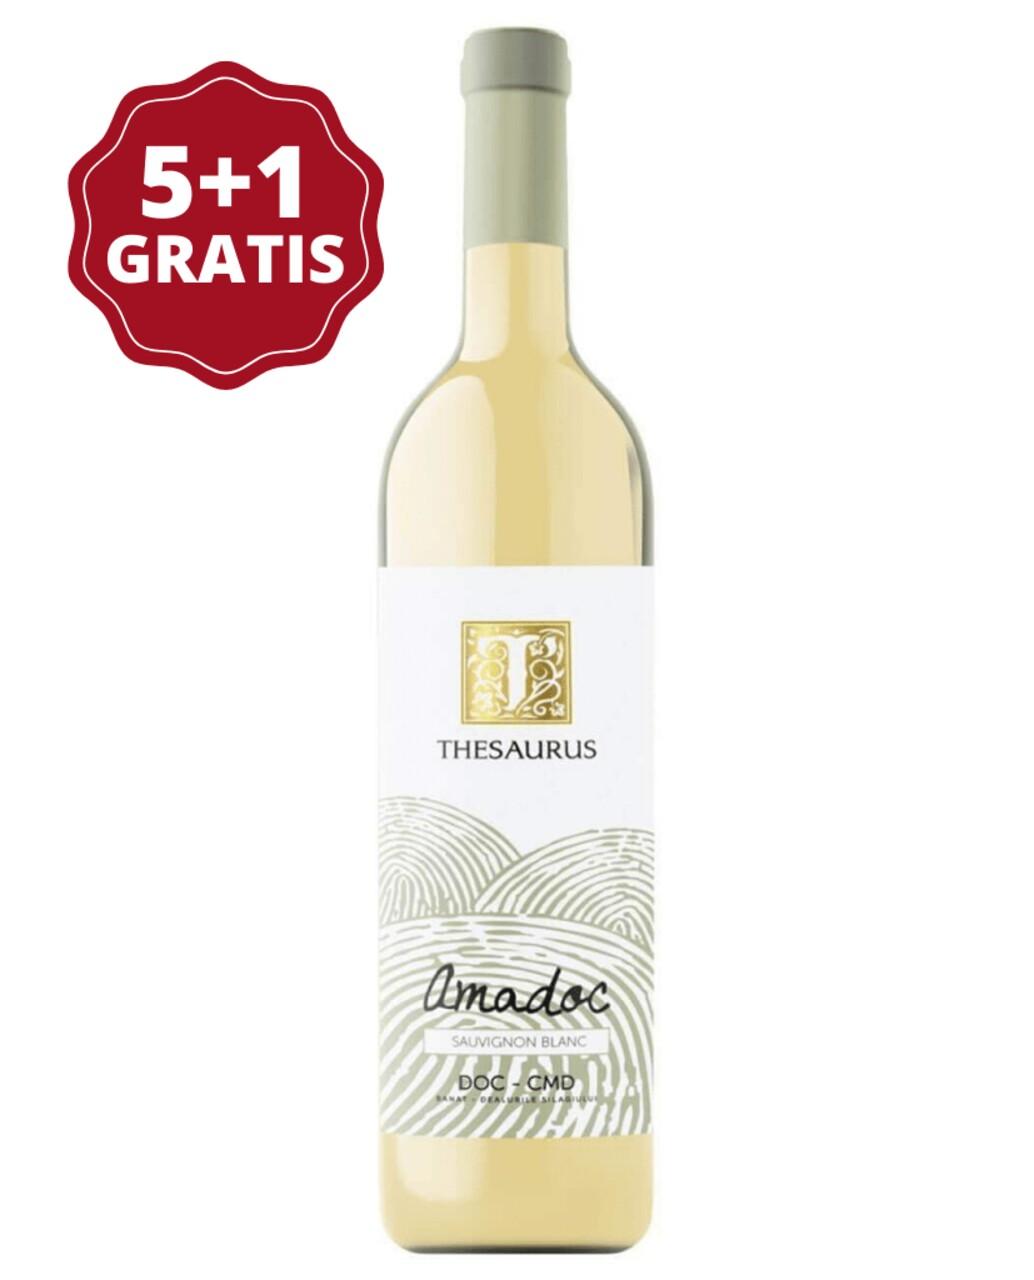 Thesaurus Amadoc Sauvignon Blanc 5+1